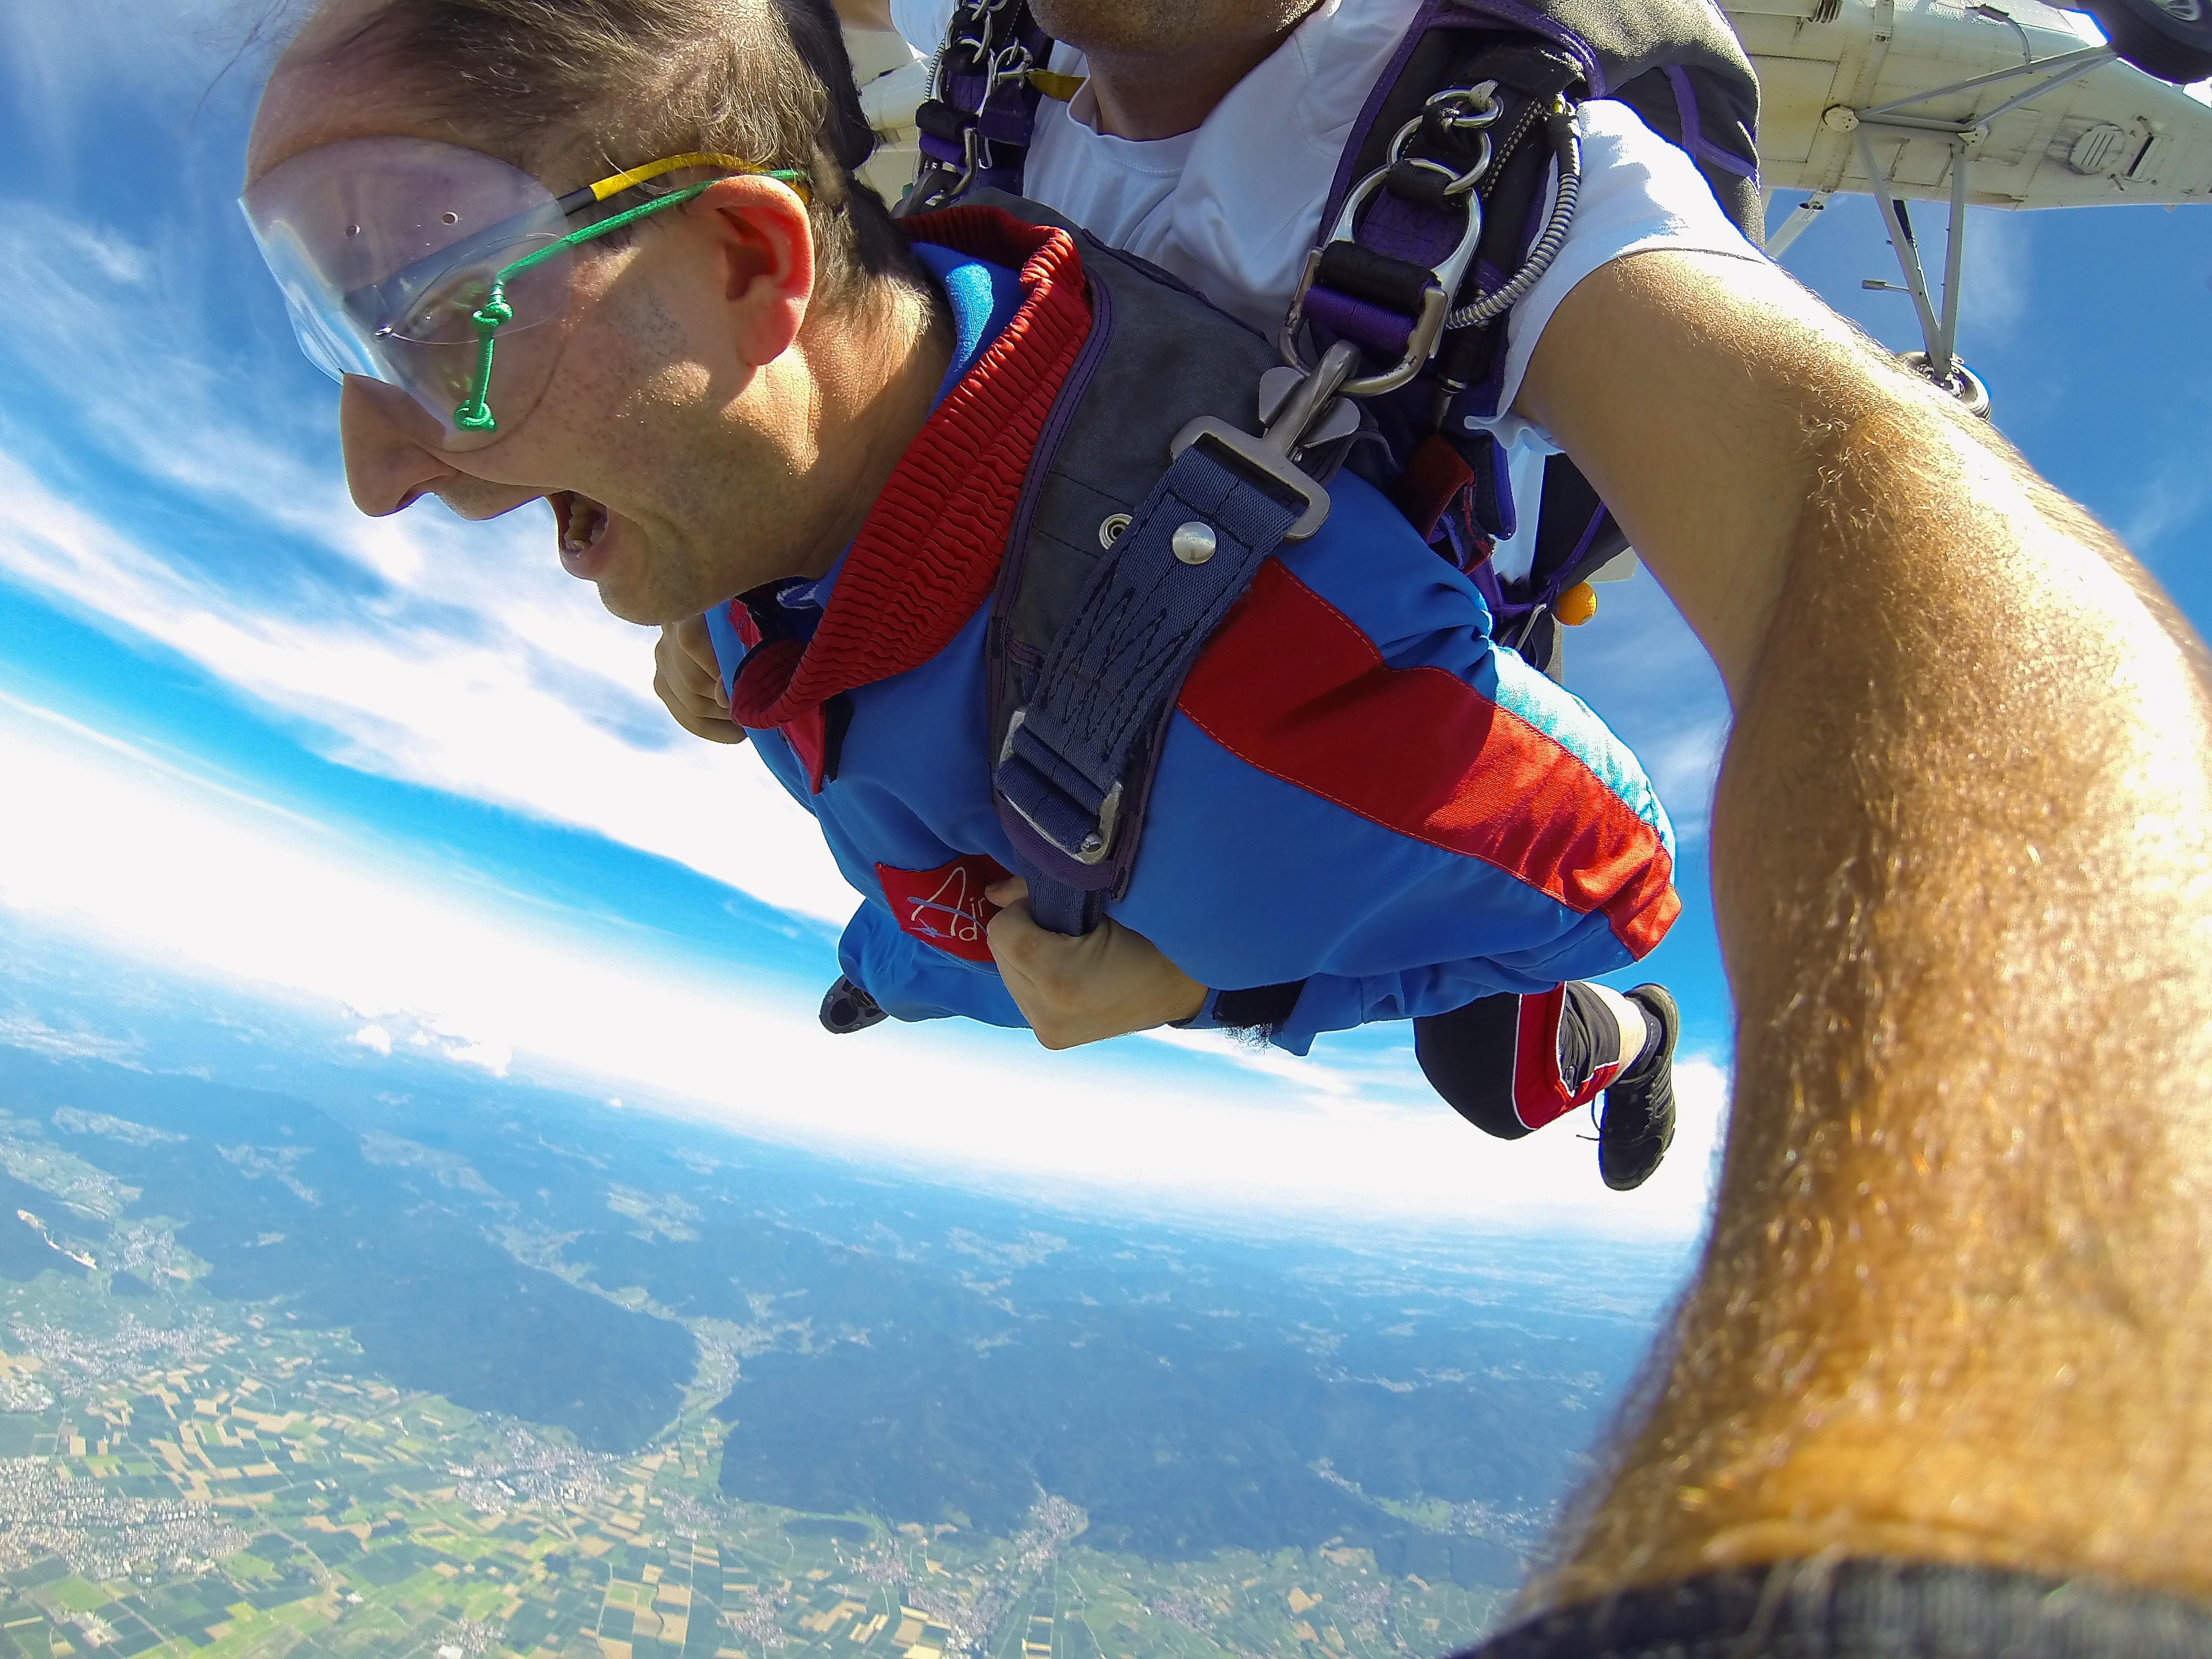 Fallschirmsprung aus 4000 Metern